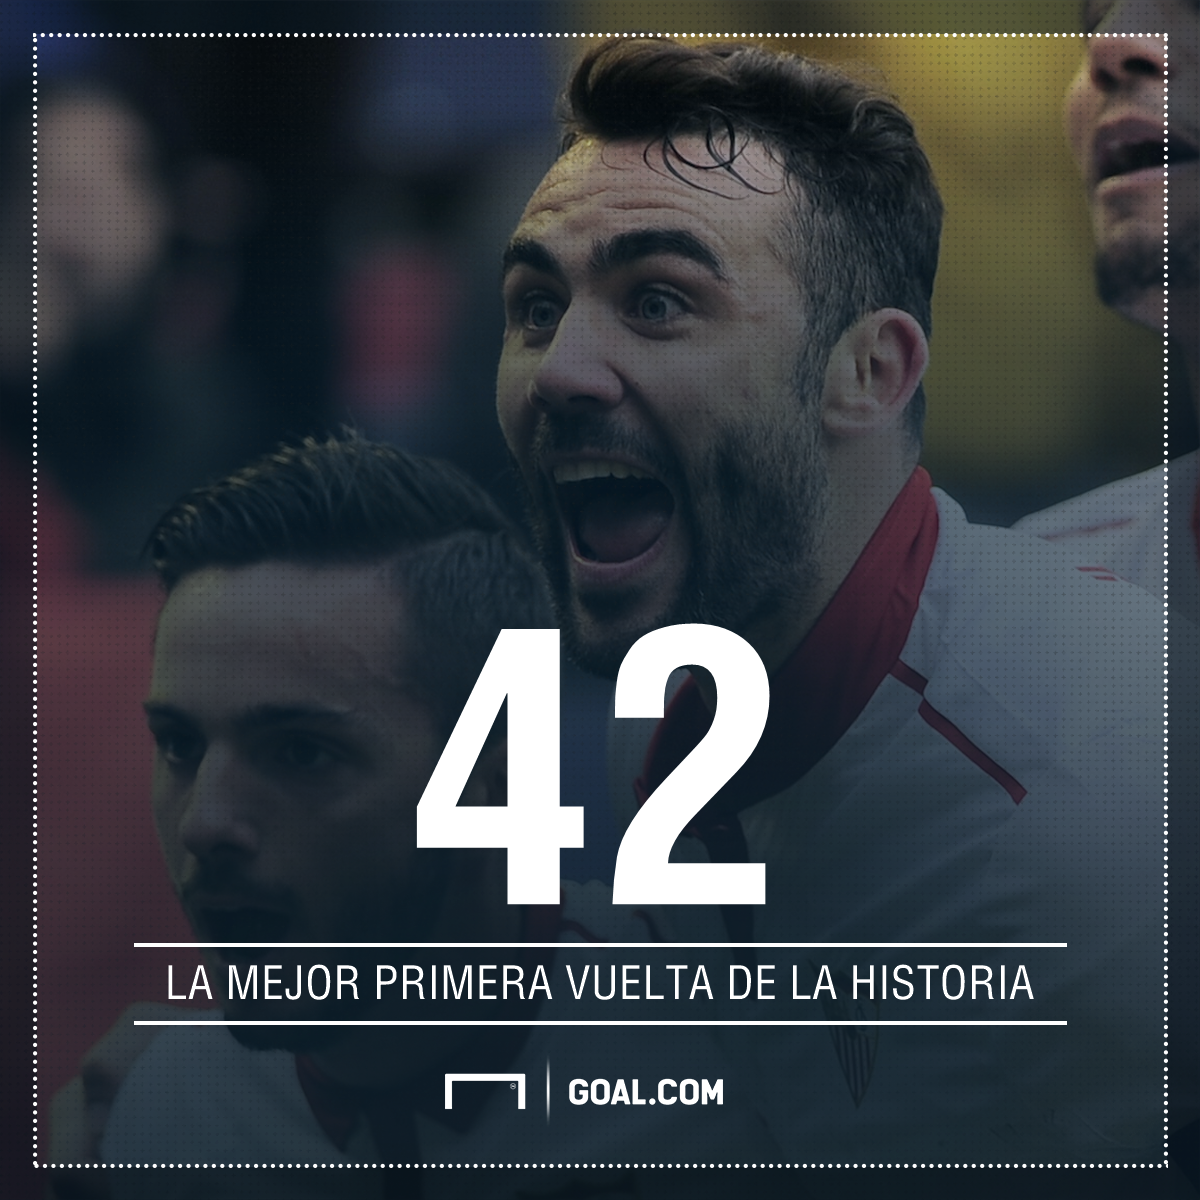 El récord que quebró Sampaoli como entrenador del Sevilla